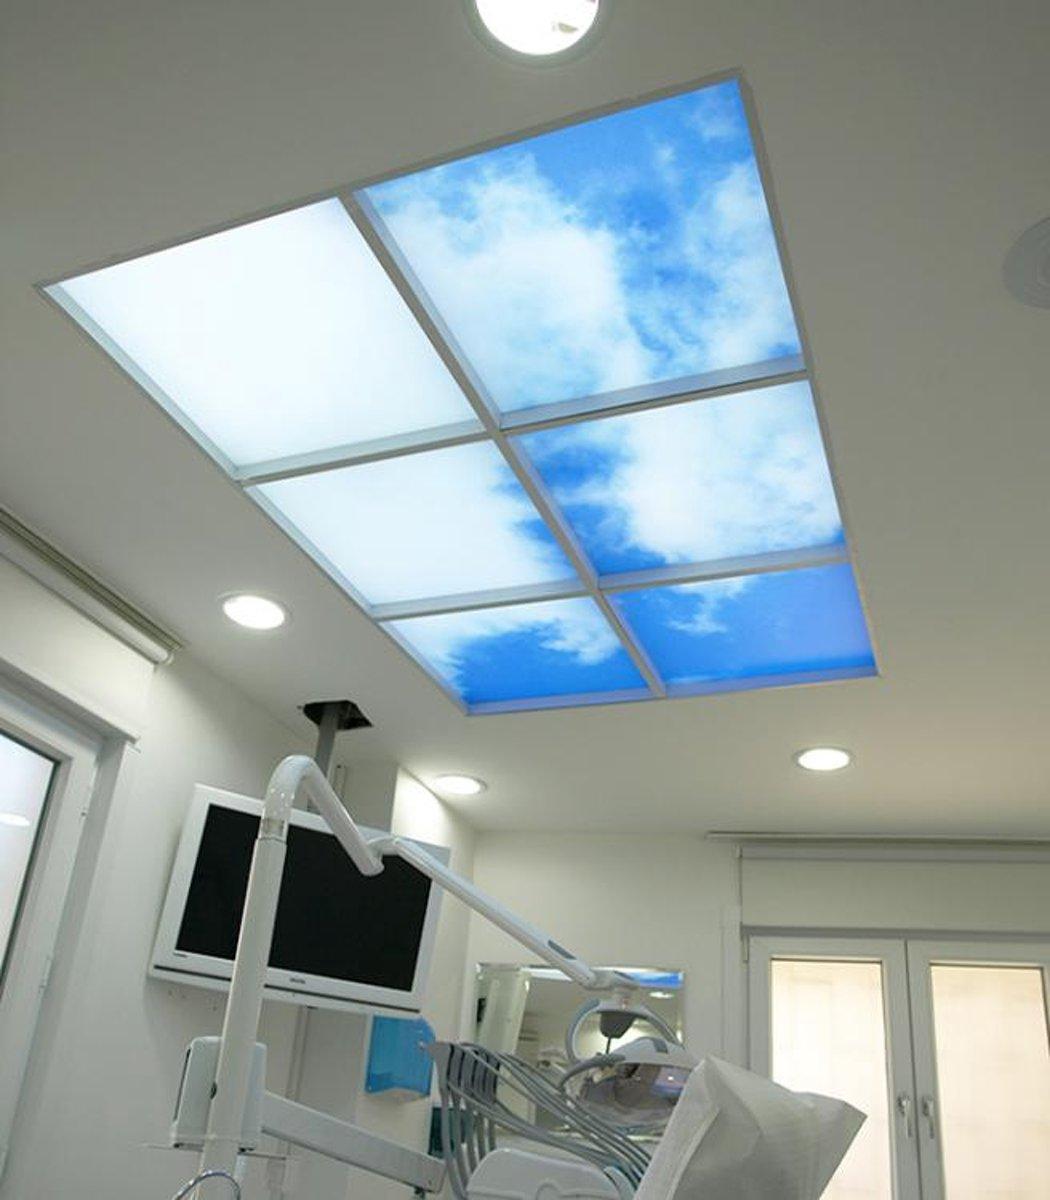 bol.com | Systeemplafond verlichting kopen? Kijk snel!